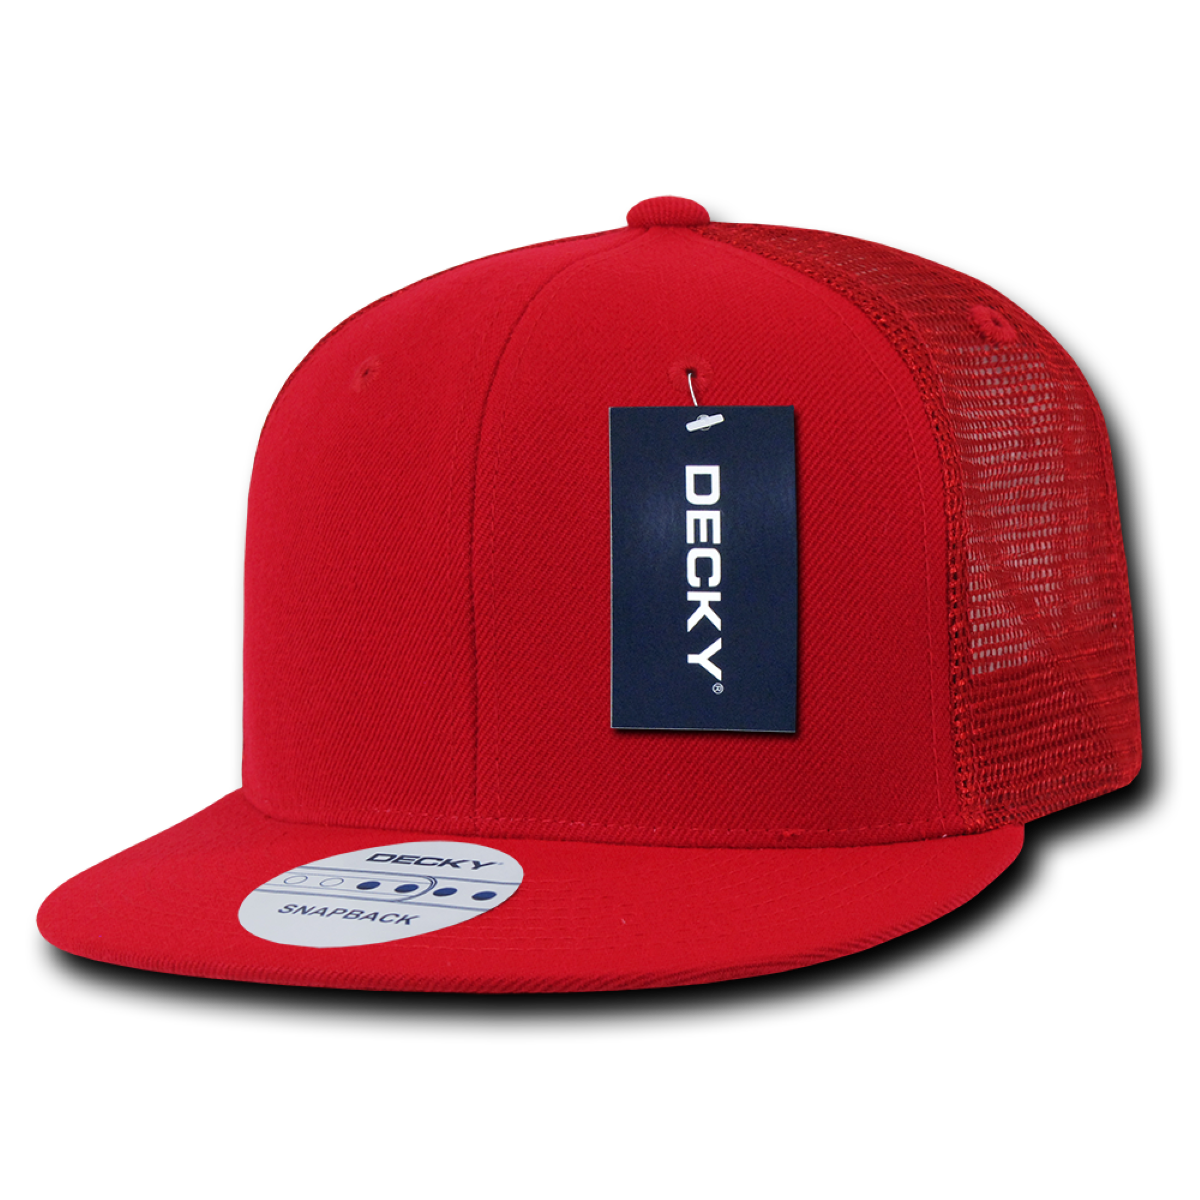 Decky Trucker Hats: Decky 6 Panel Flat Bill Trucker Cap, Red